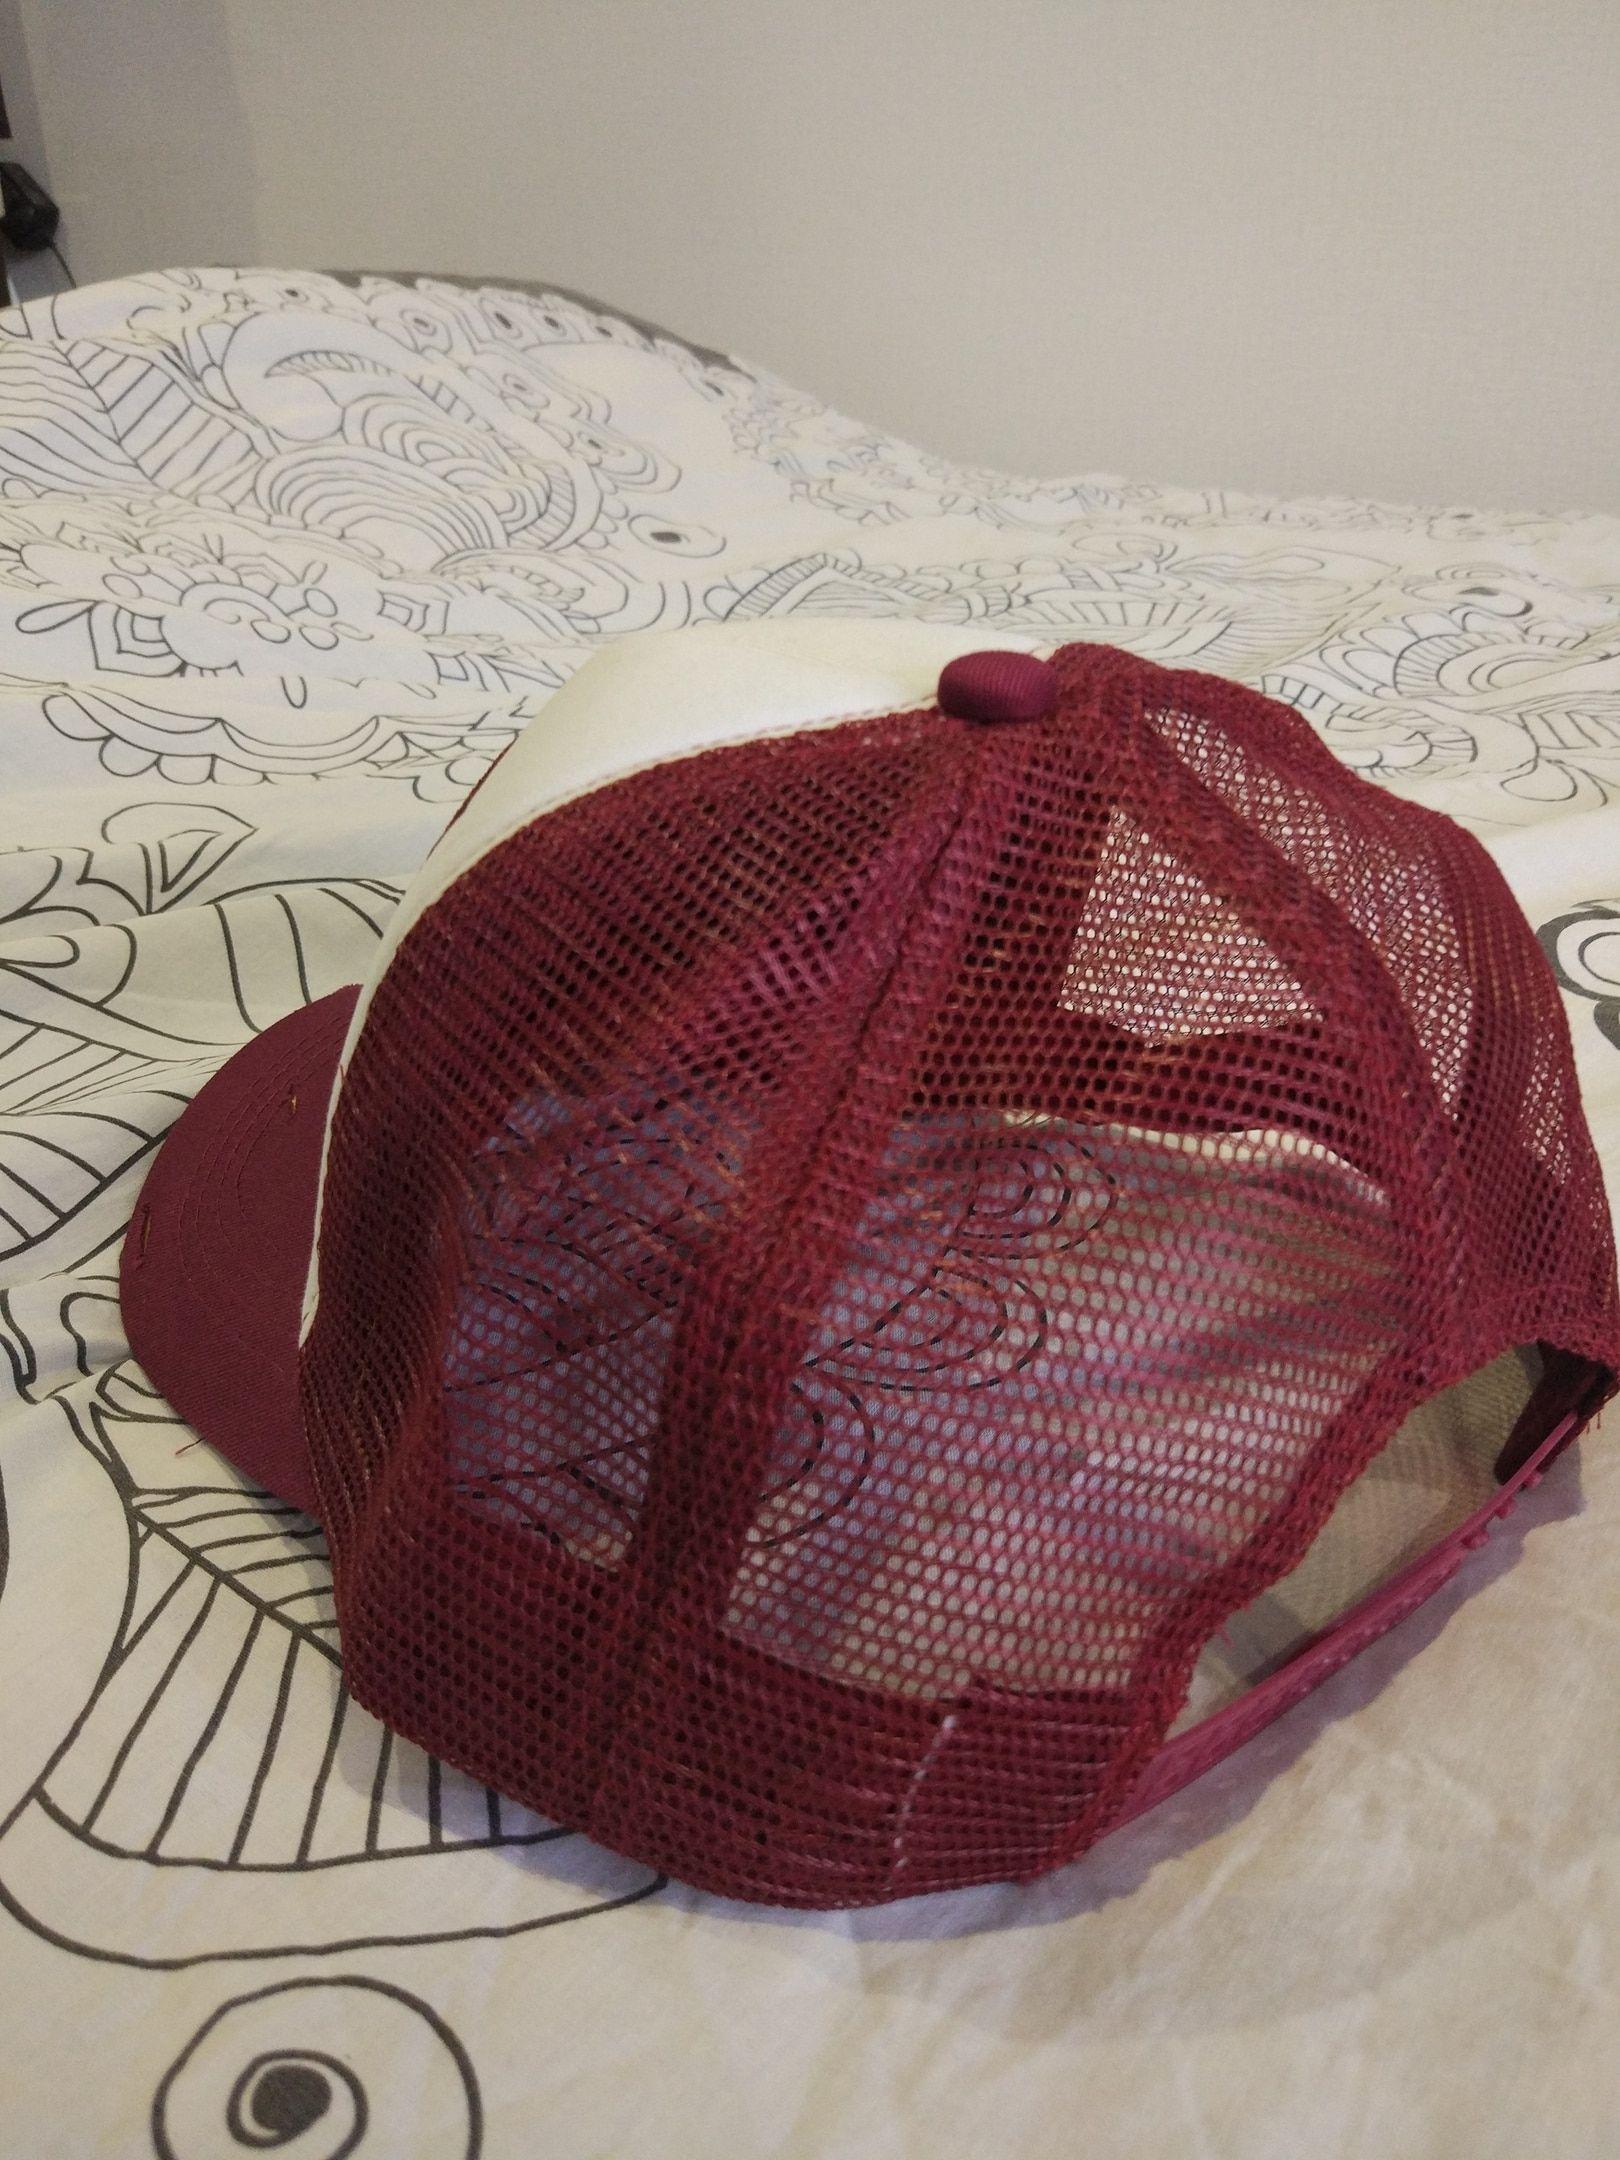 9445da0d [FLB] Summer Baseball Cap Embroidery Mesh Cap Hats For Men Women Gorra -  chicmaxonline